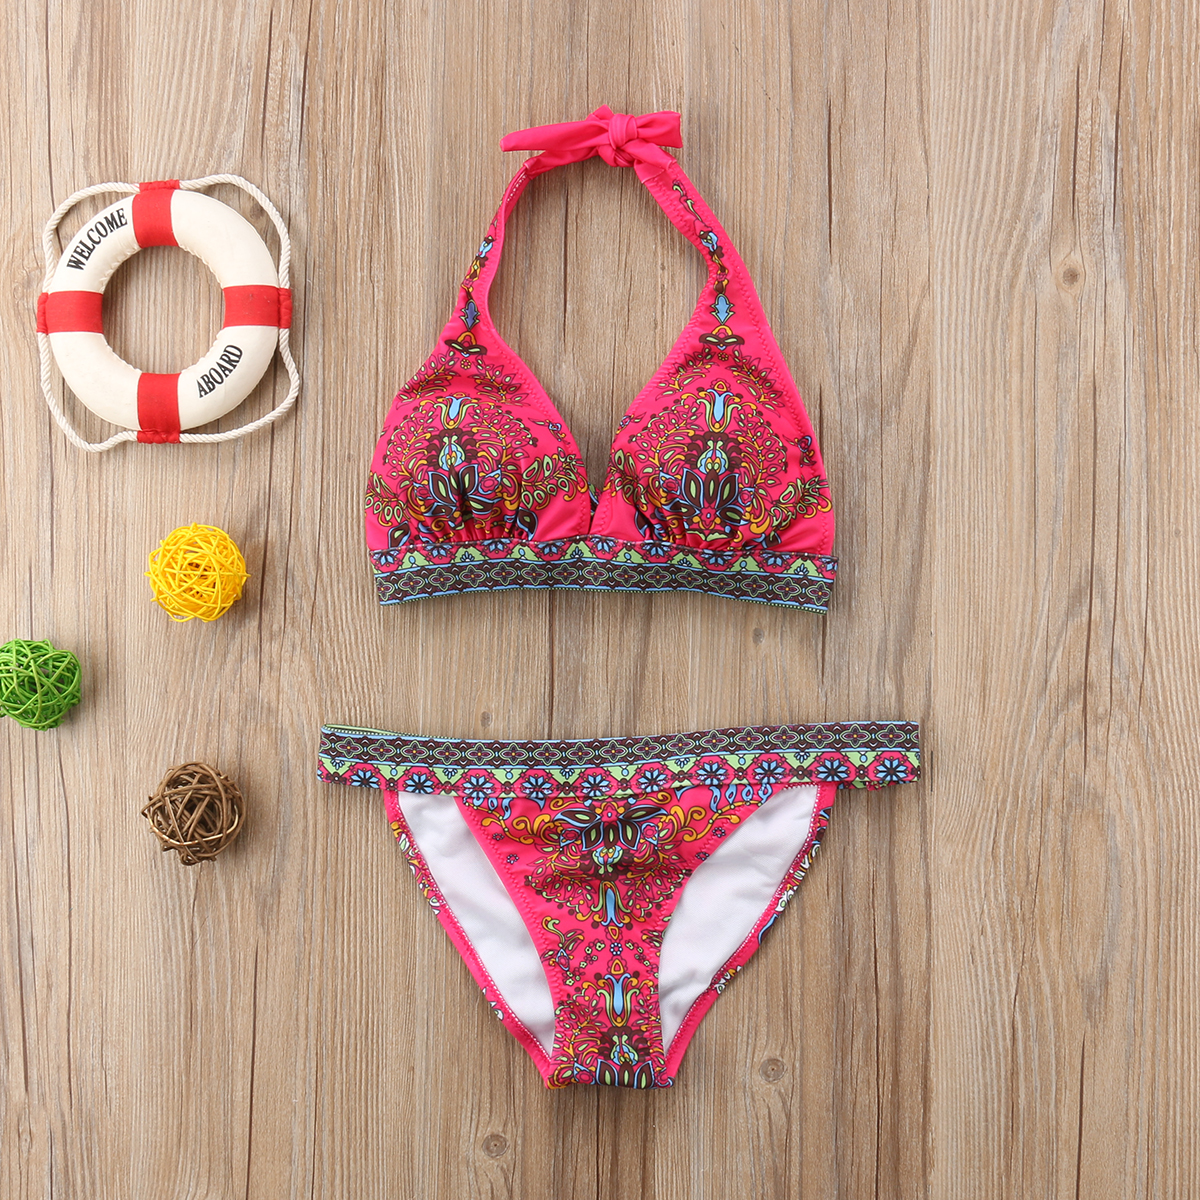 2019 New Floral Printed Women Bikini Set Push-up Swimsuit Bandage Swimming Costume Bathing Suit Swimwear Monokini Beachwear